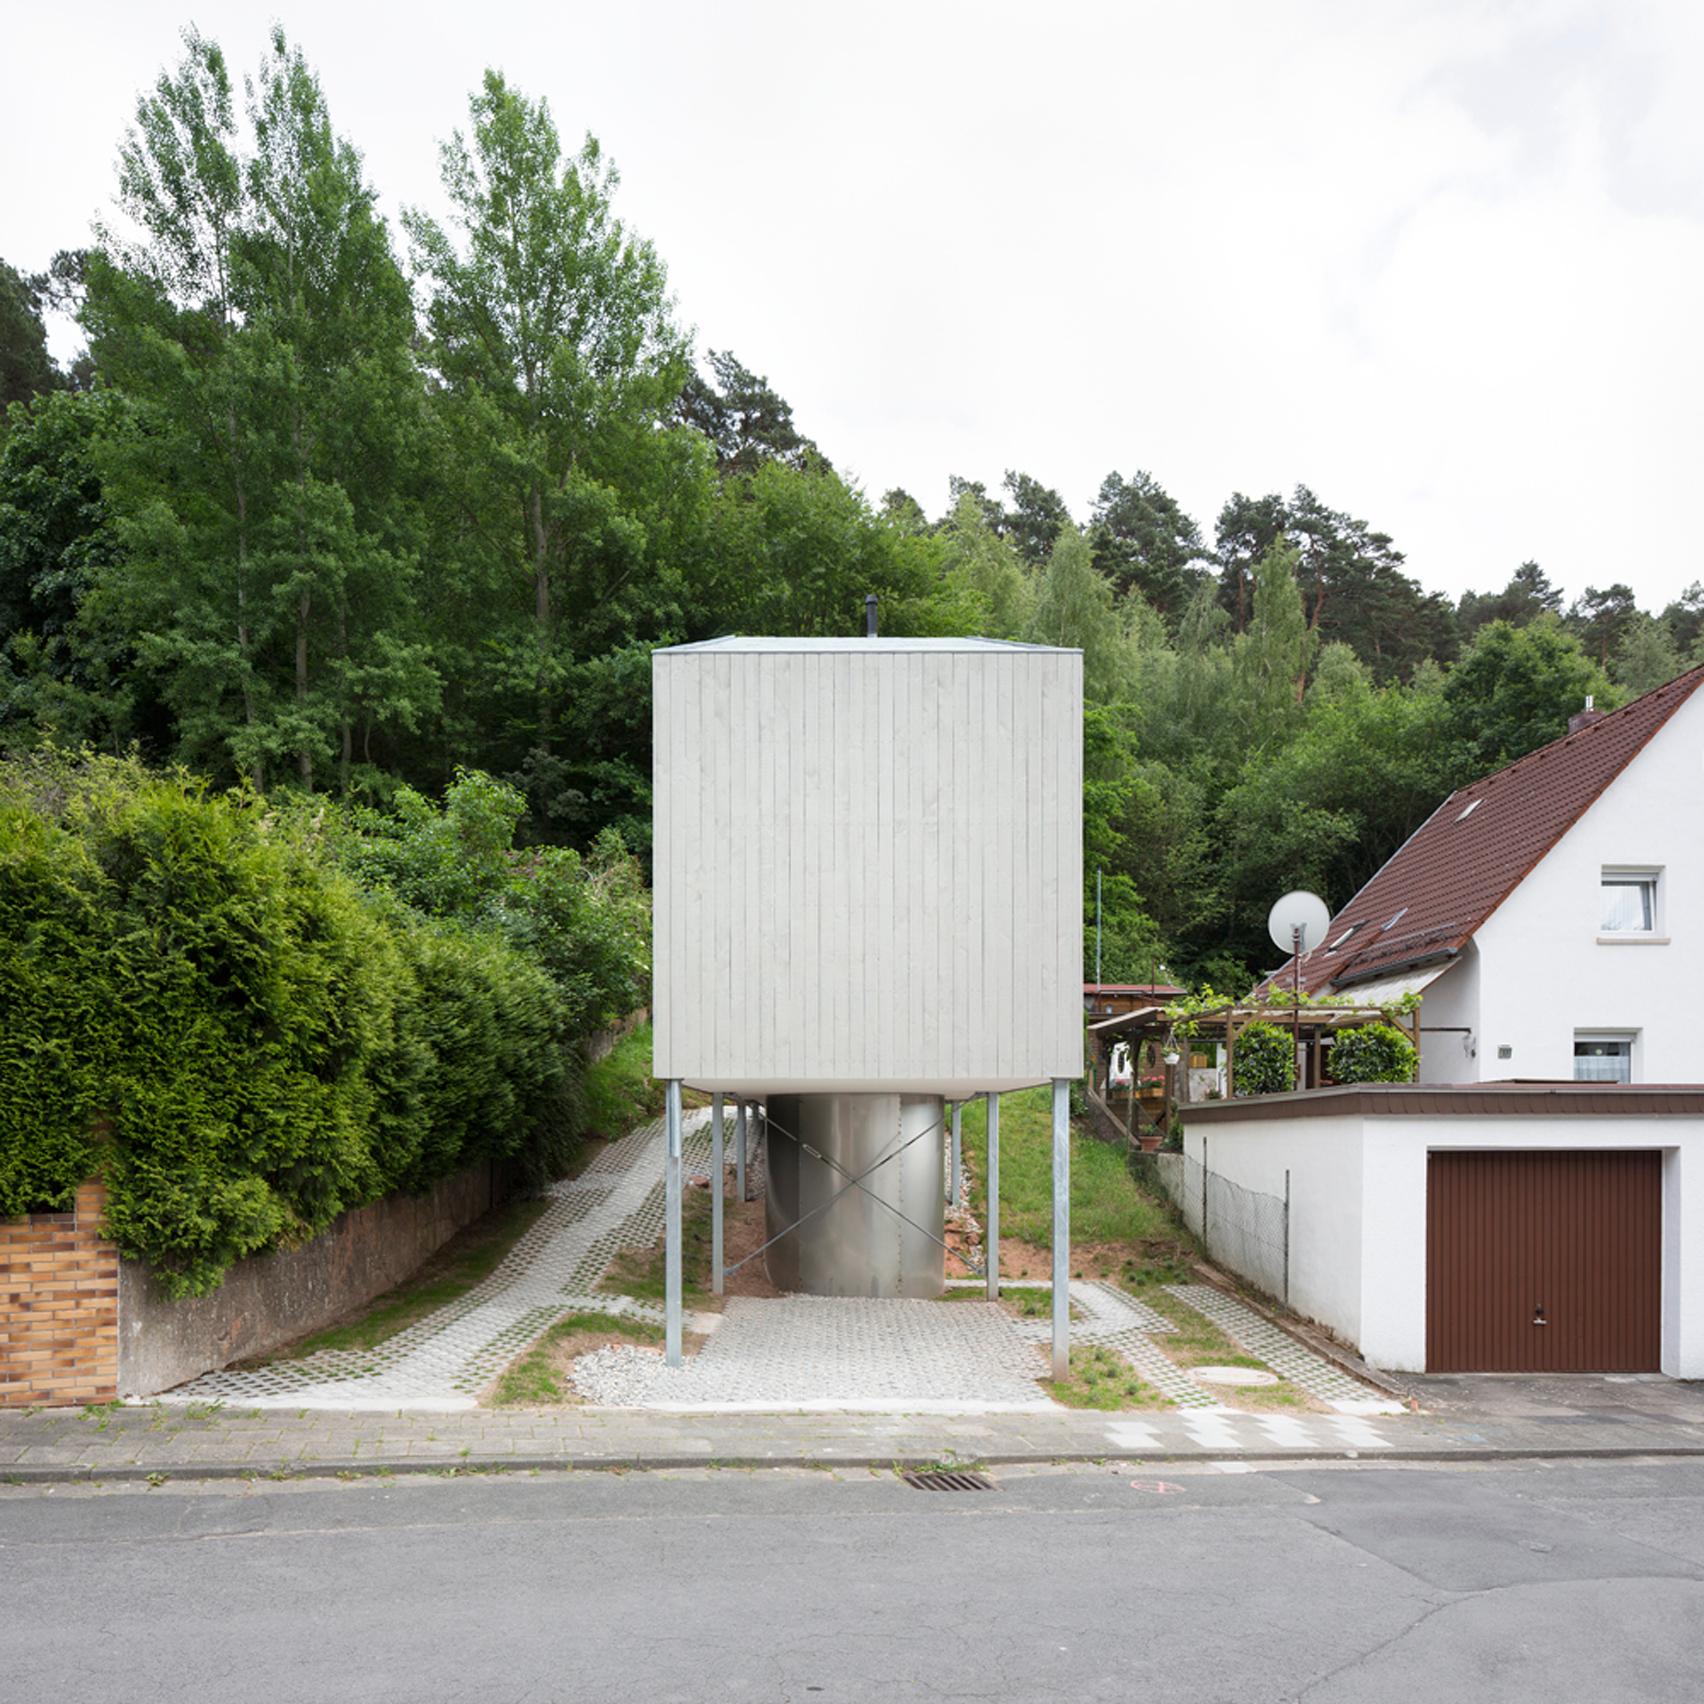 small-house-architekturburo-scheder-micro-homes-roundups-architecture_dezeen_sq.jpg